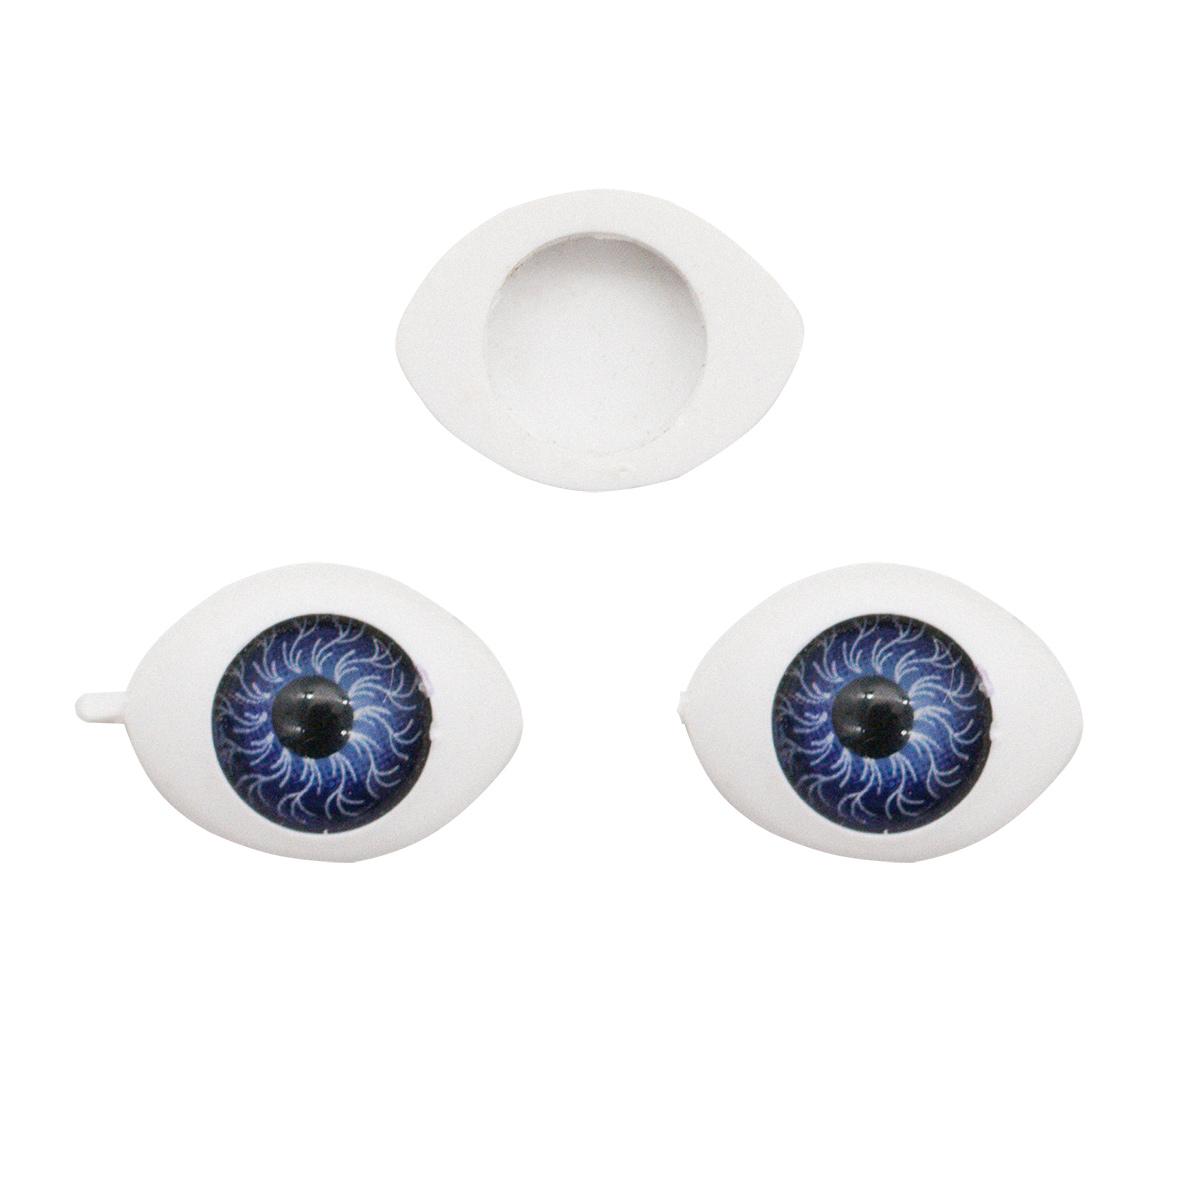 AR1620 Глаза 8мм, 10шт/упак